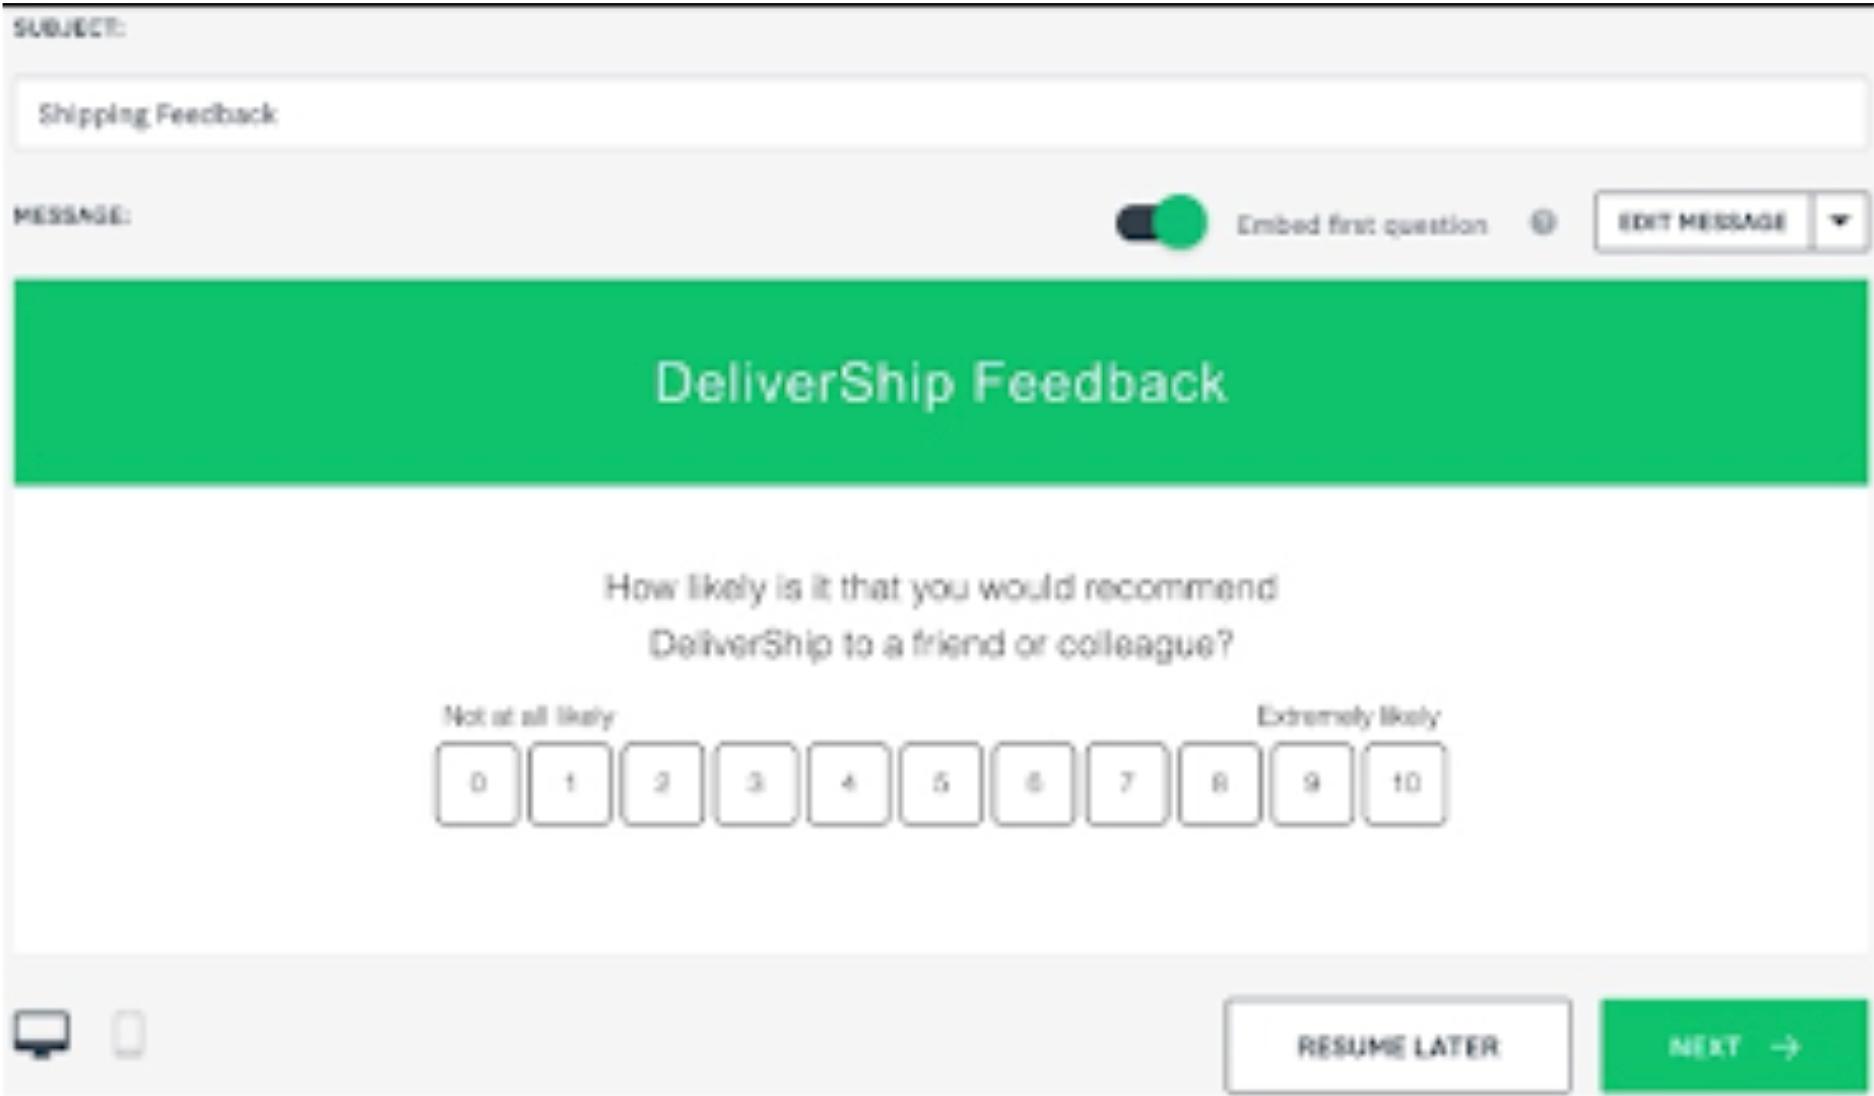 Survey Monkey: Get Cusotmer Survey & Feedback - 11 Best Inbound Marketing Tools to Boost Your Business in 2021